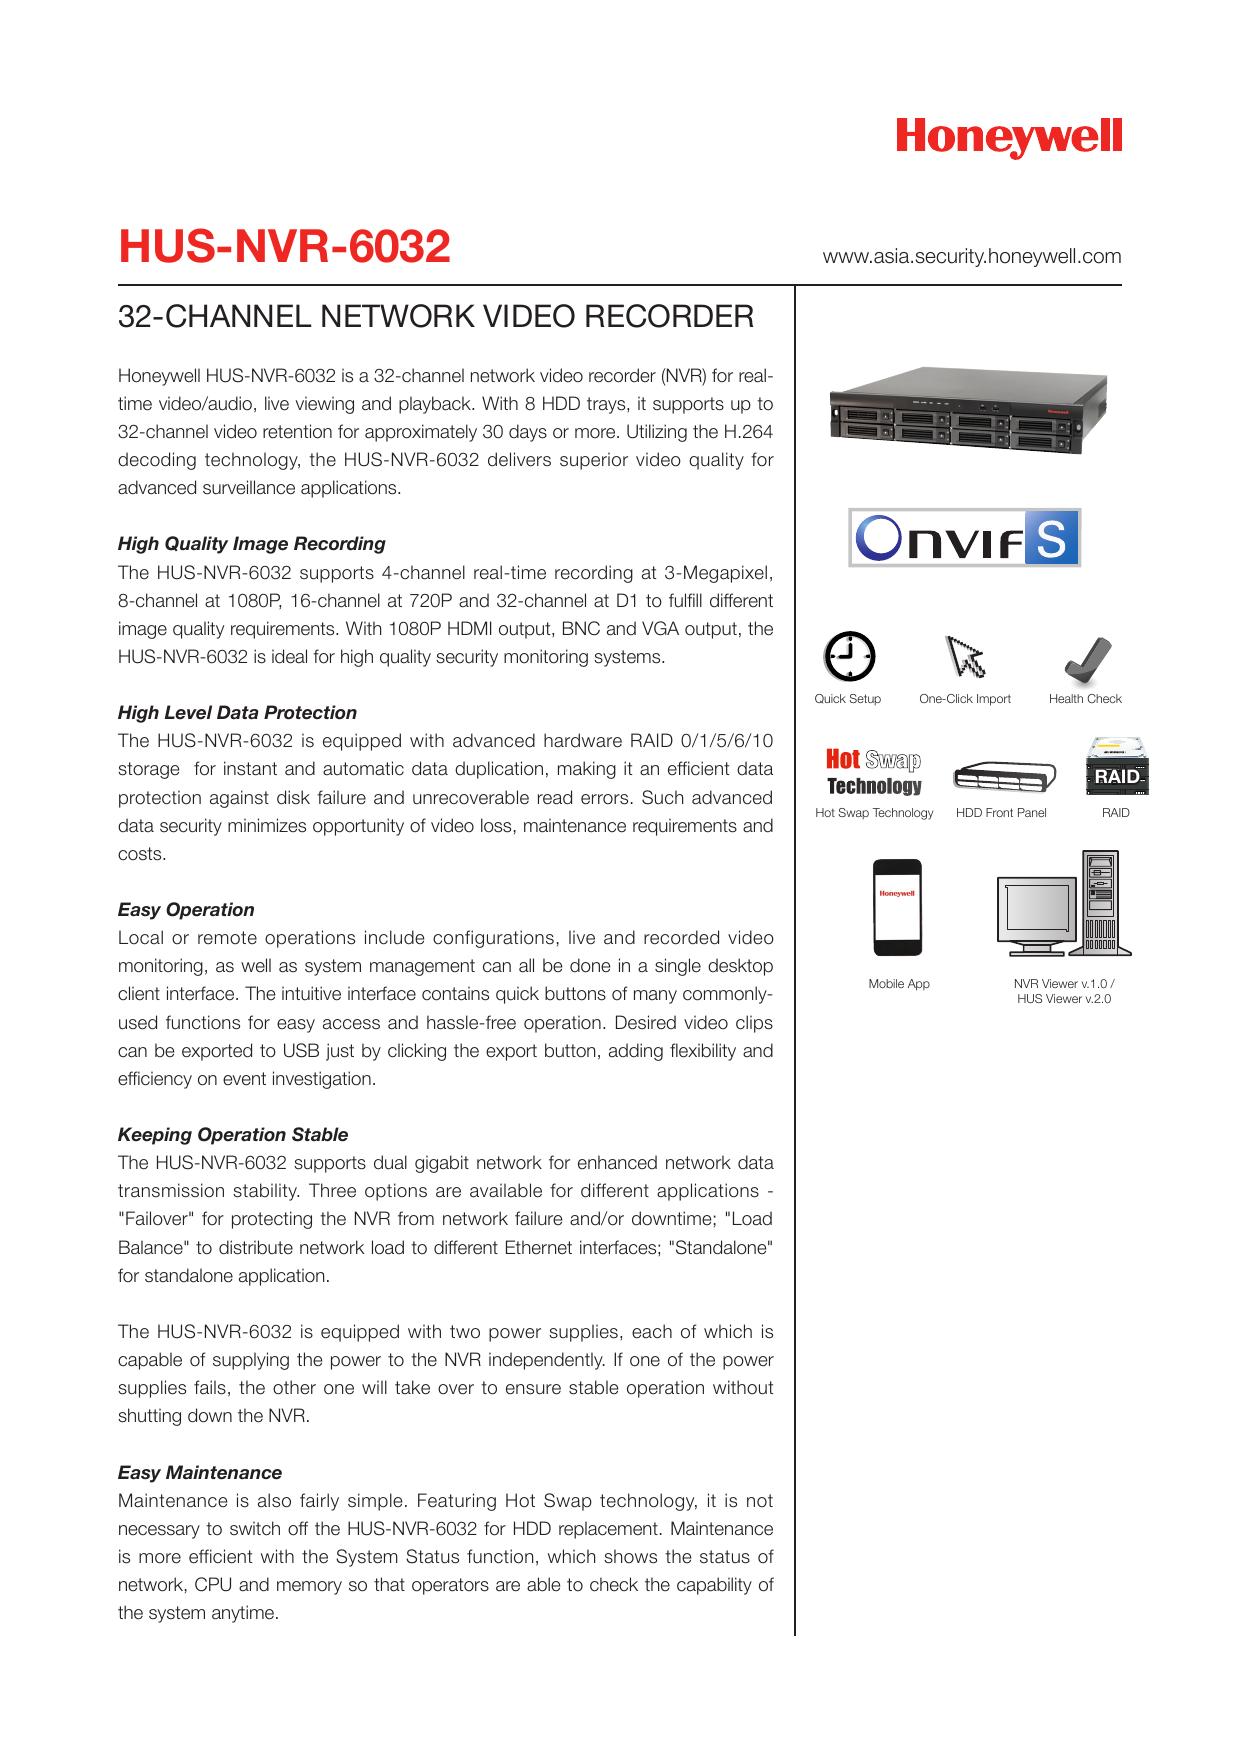 HUS-NVR-6032 - Honeywell Security Asia Pacific-IP | manualzz com